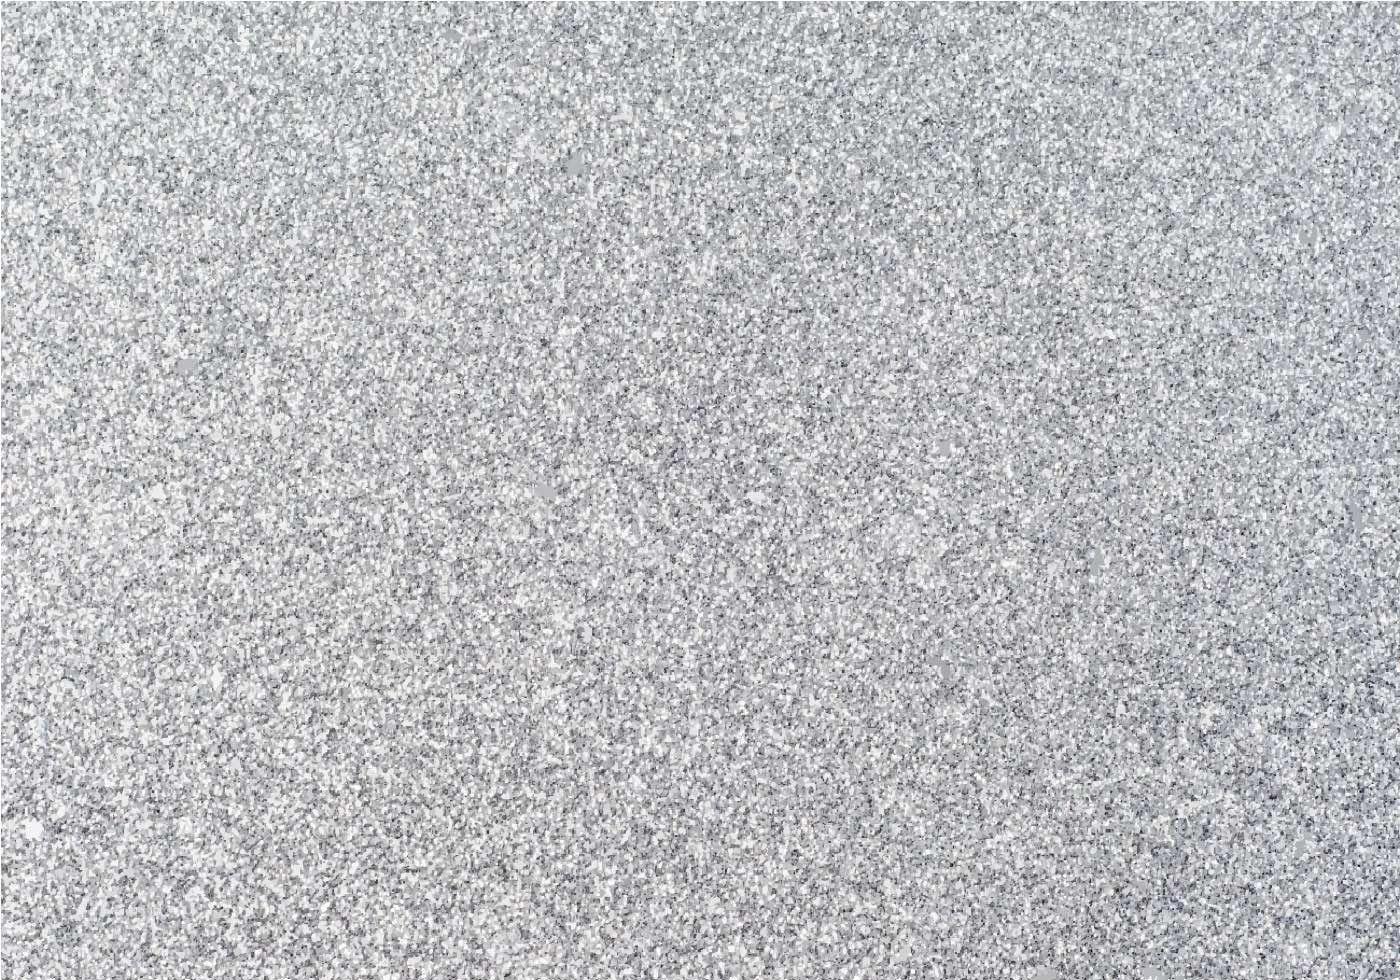 Silver Glitter Backgrounds